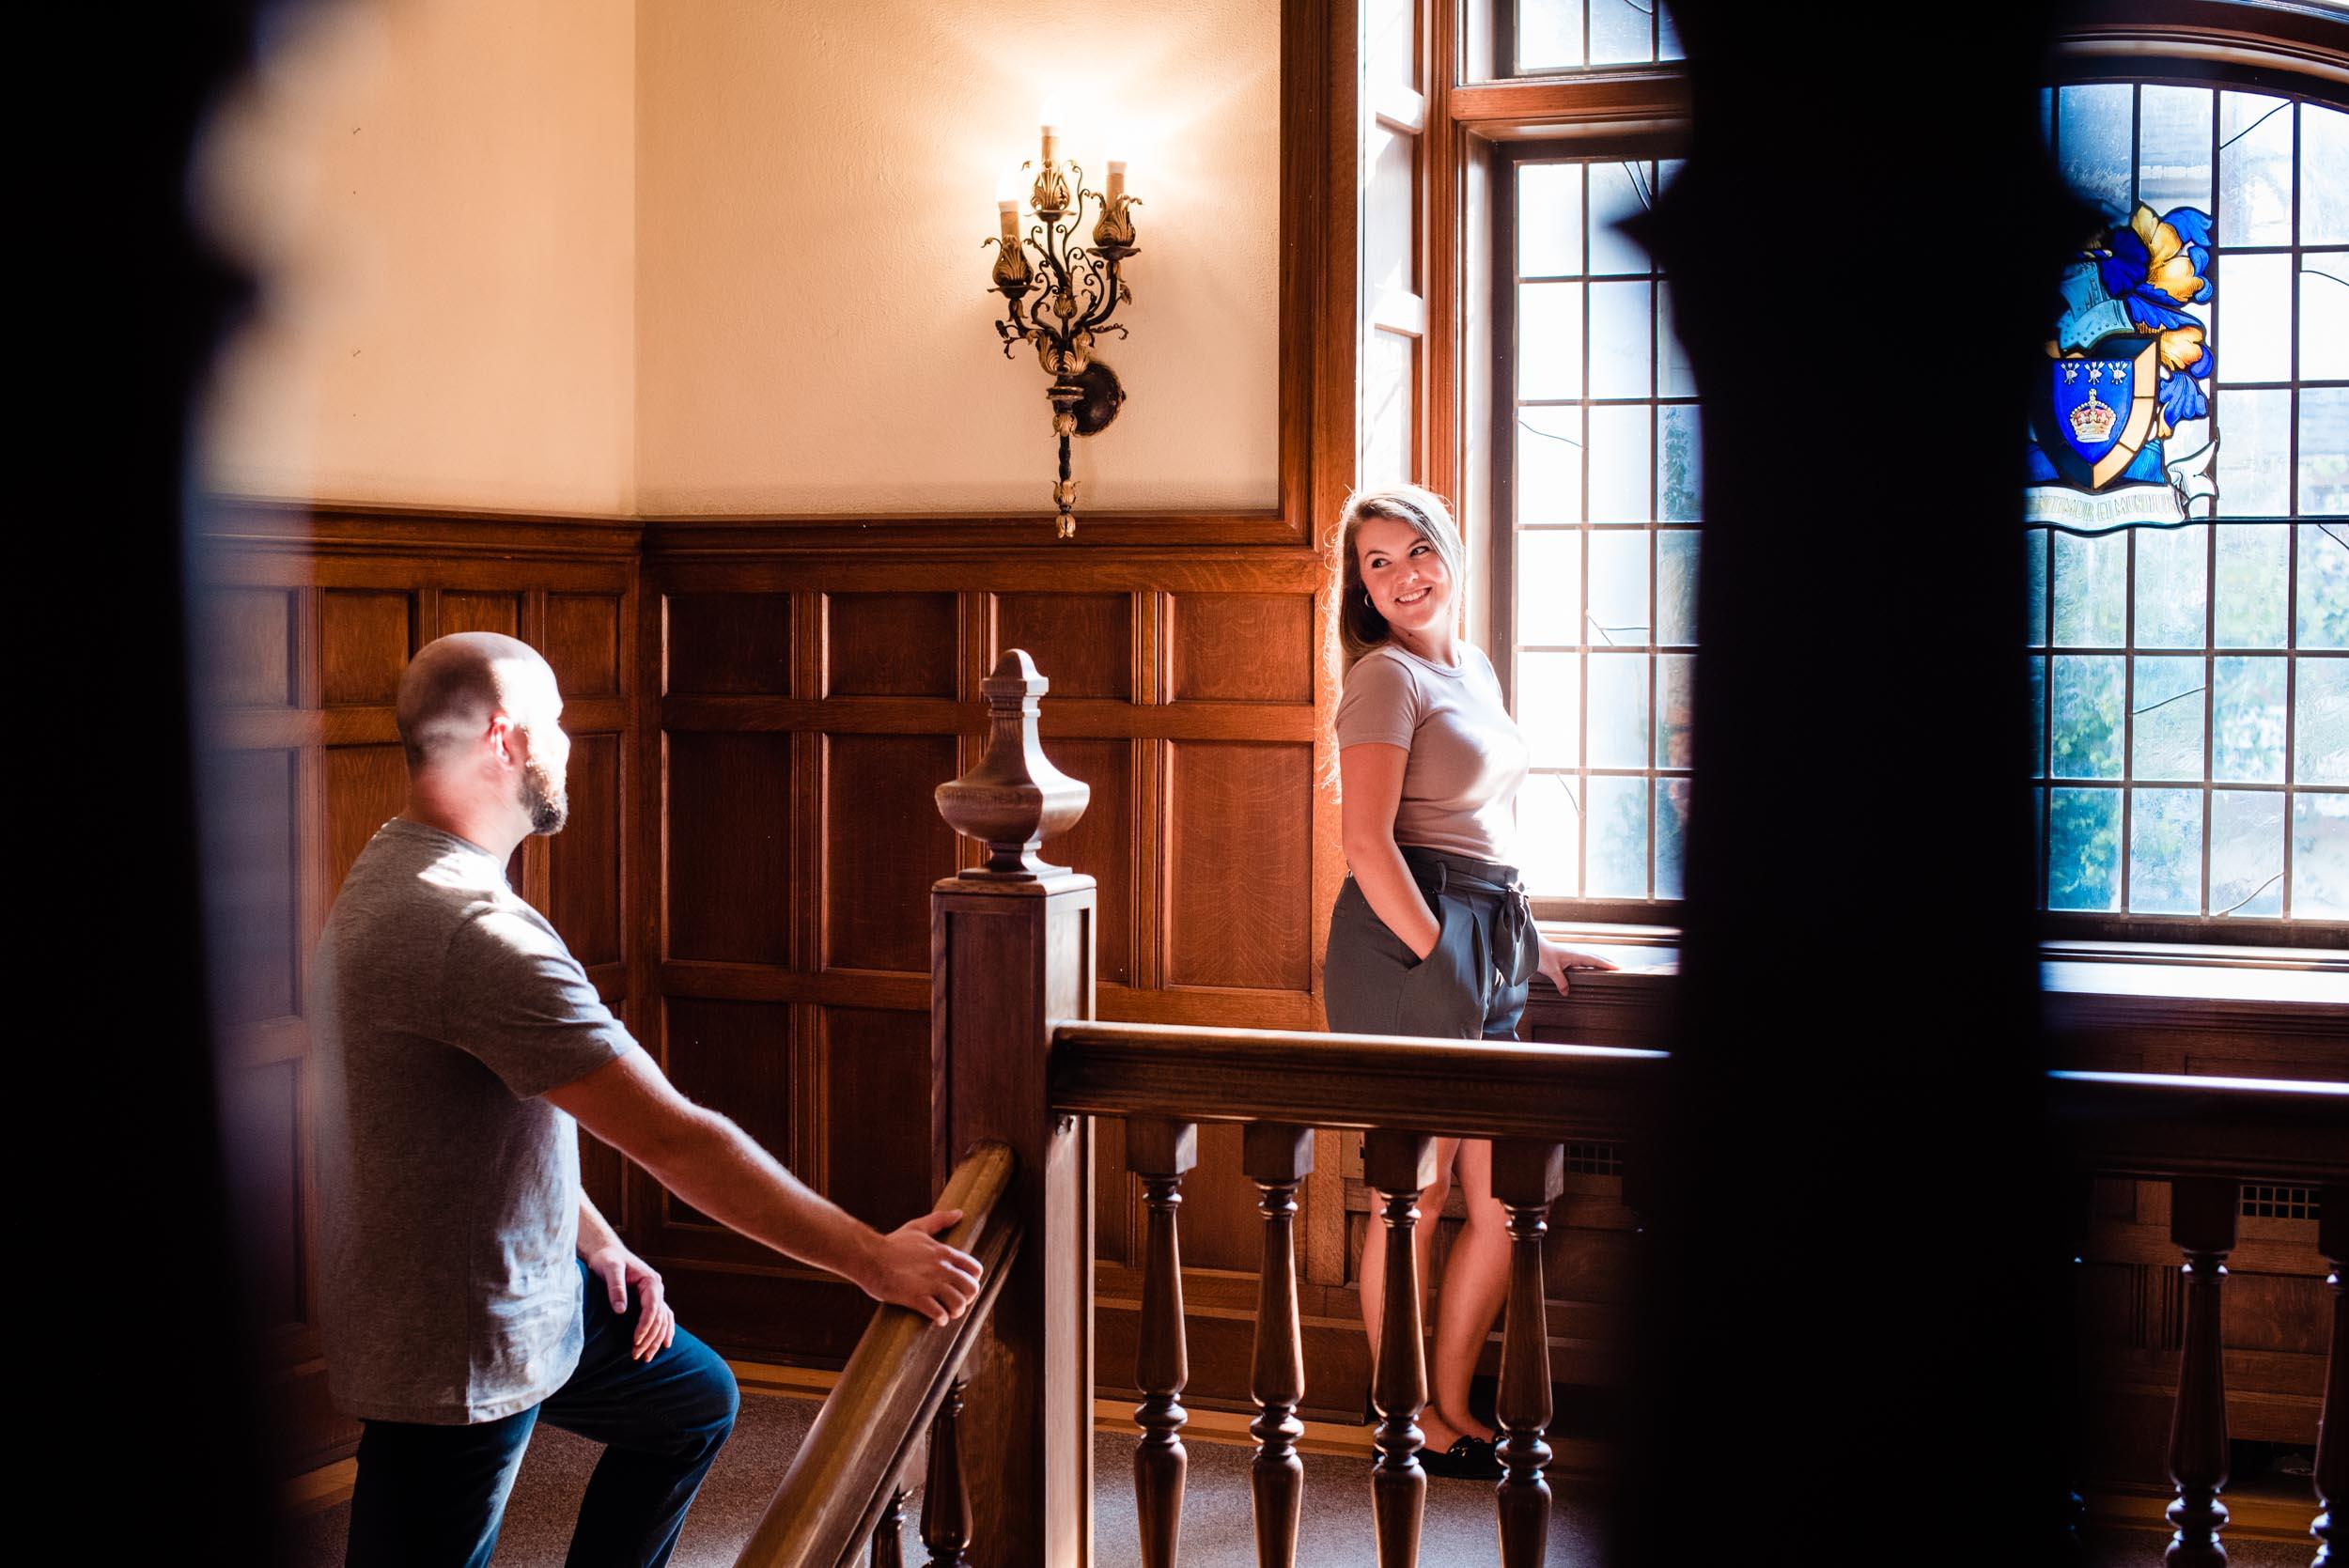 Engagement-Photography-King-College-London-Ontario (8).jpg